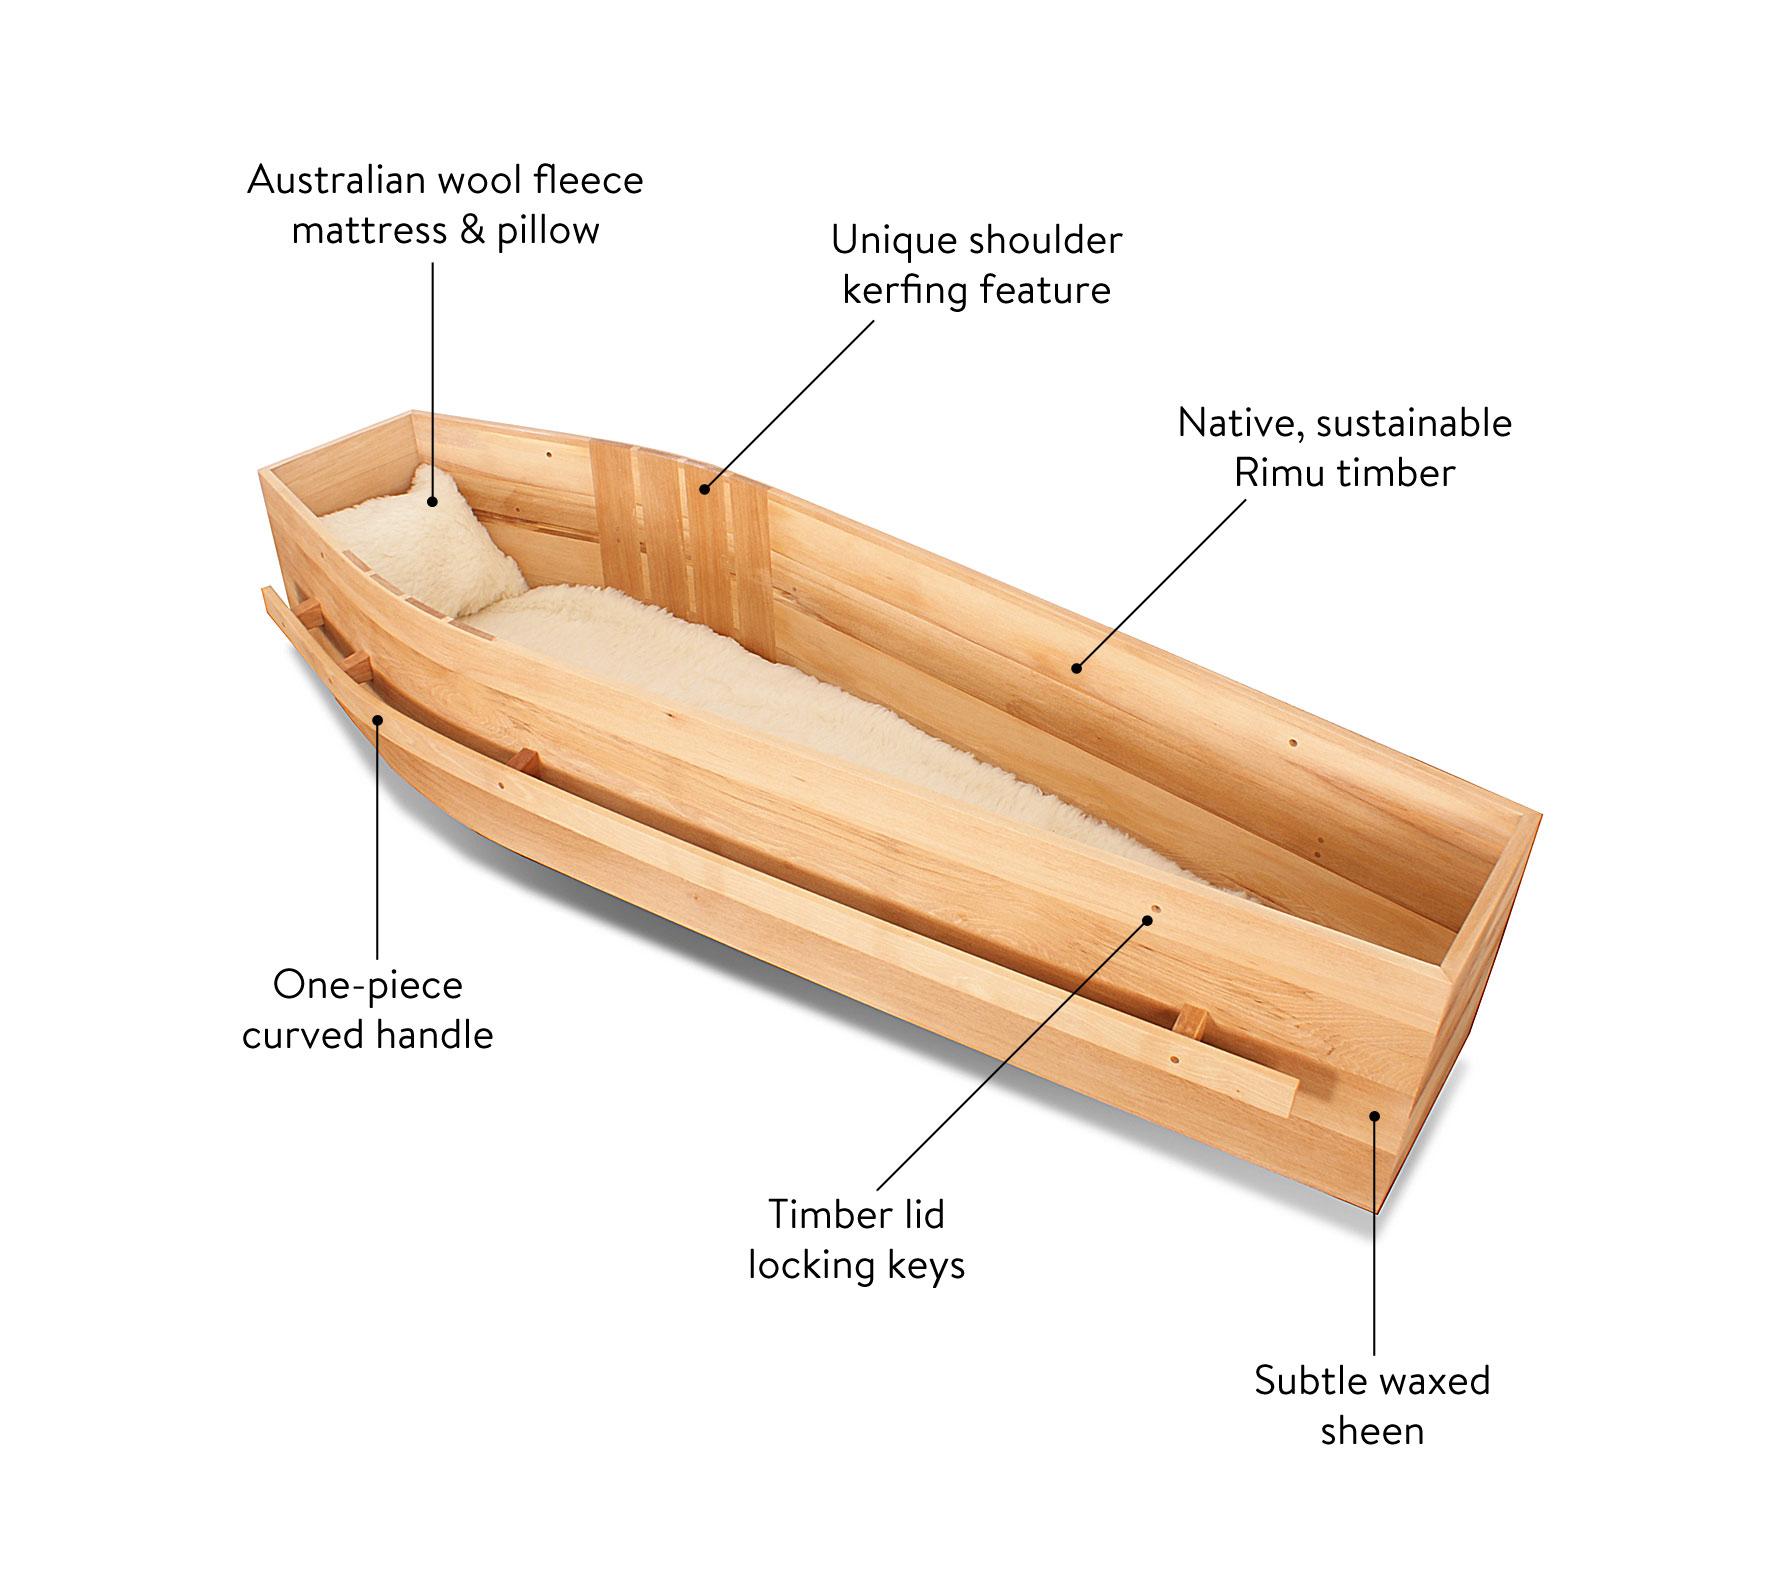 Taking Wooden Furniture To Australia